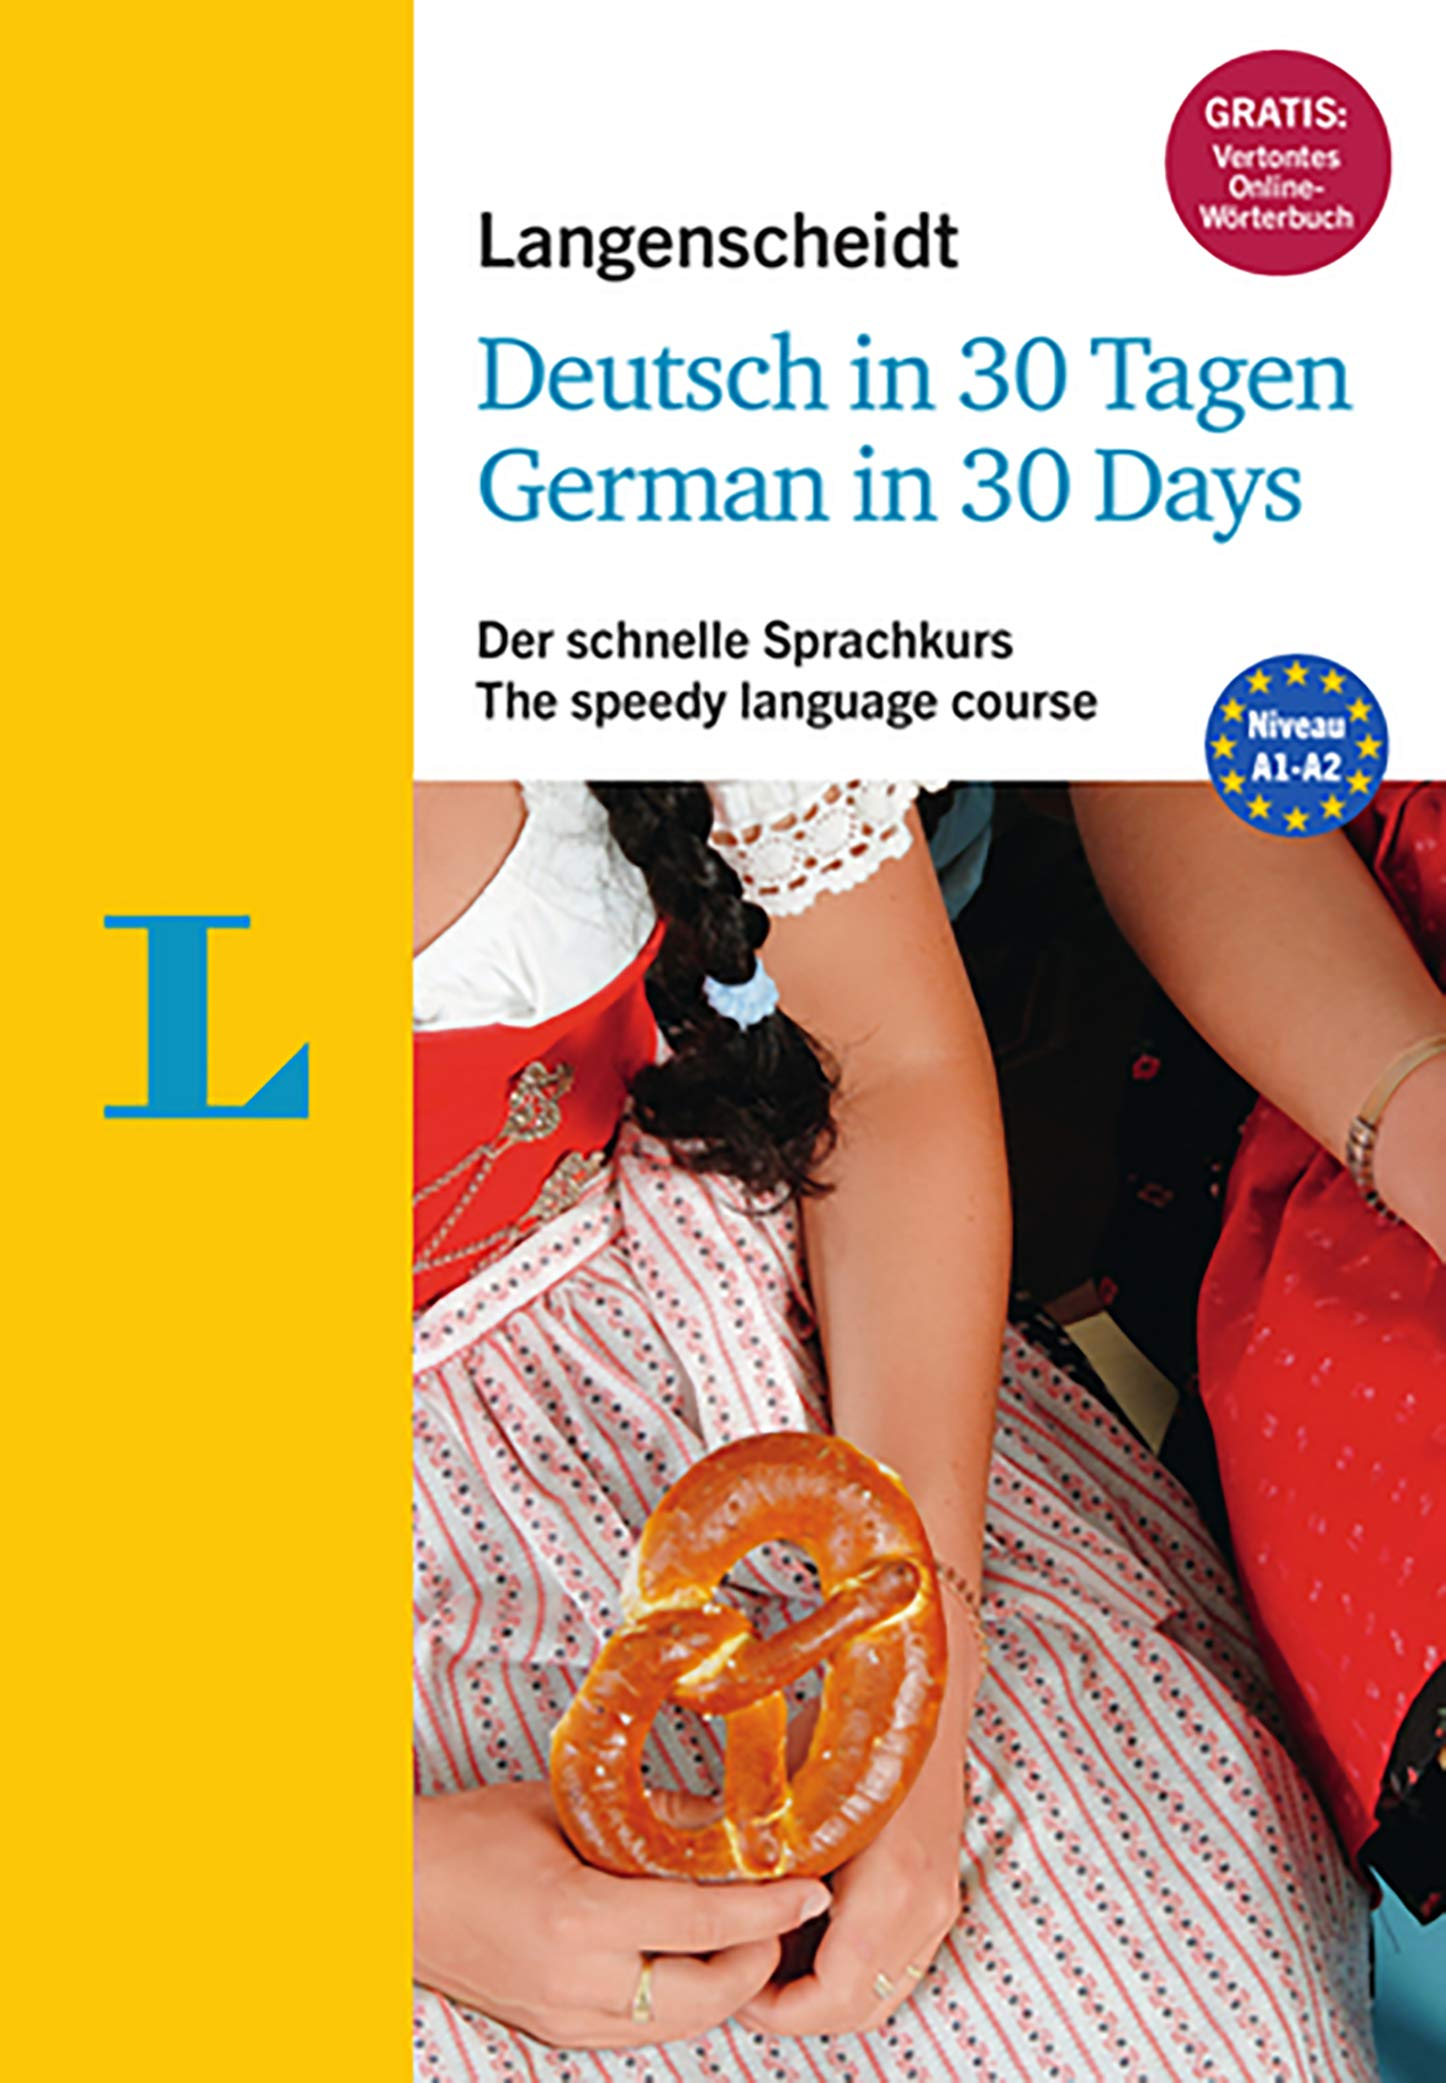 Langenscheidt Deutsch in 30 Tagen Langenscheidt German in 30 days - Language course with book, 2 Audio-CDs, 1 MP3-CD and MP3-Download: German language course for native English speakers